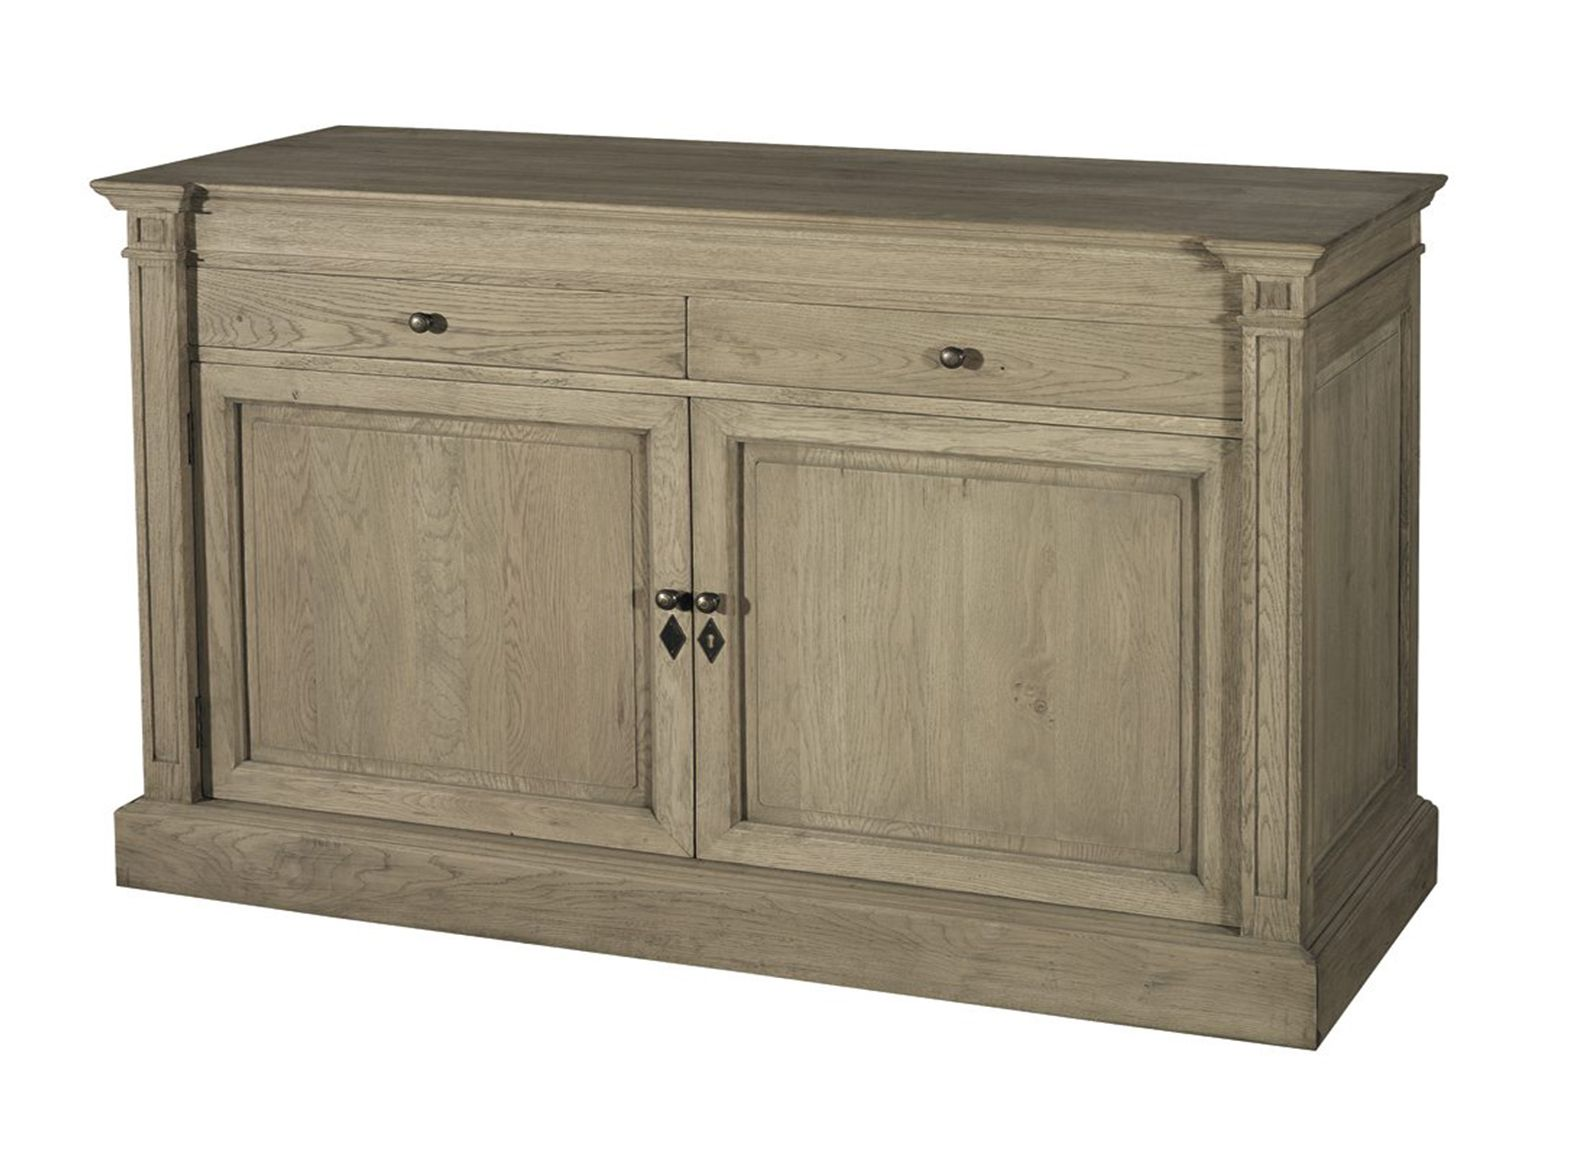 Buffet signature haussman 2 portes - Signature meubles ...